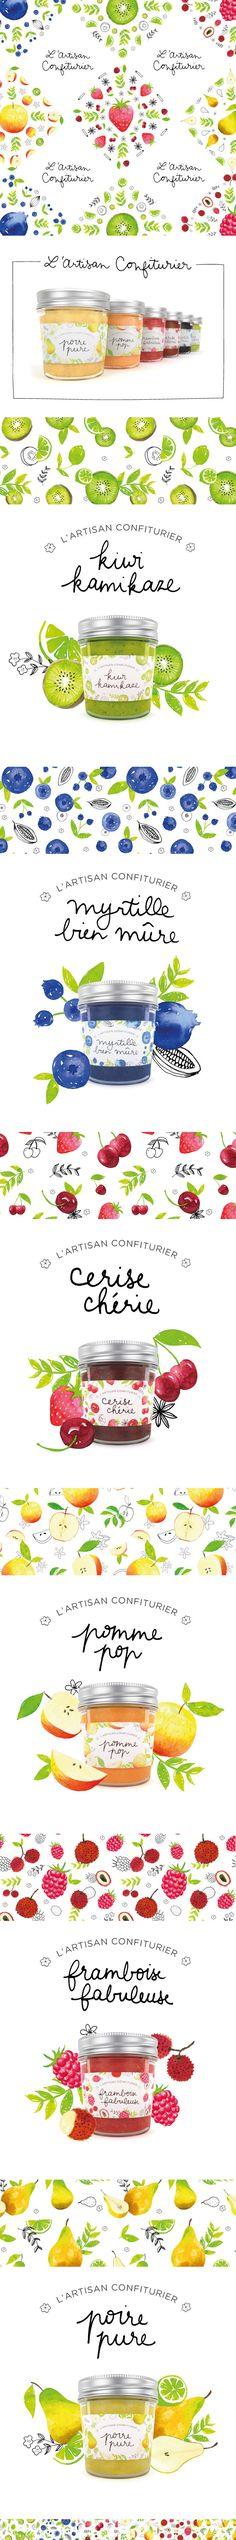 Illustrated marmelade packaging